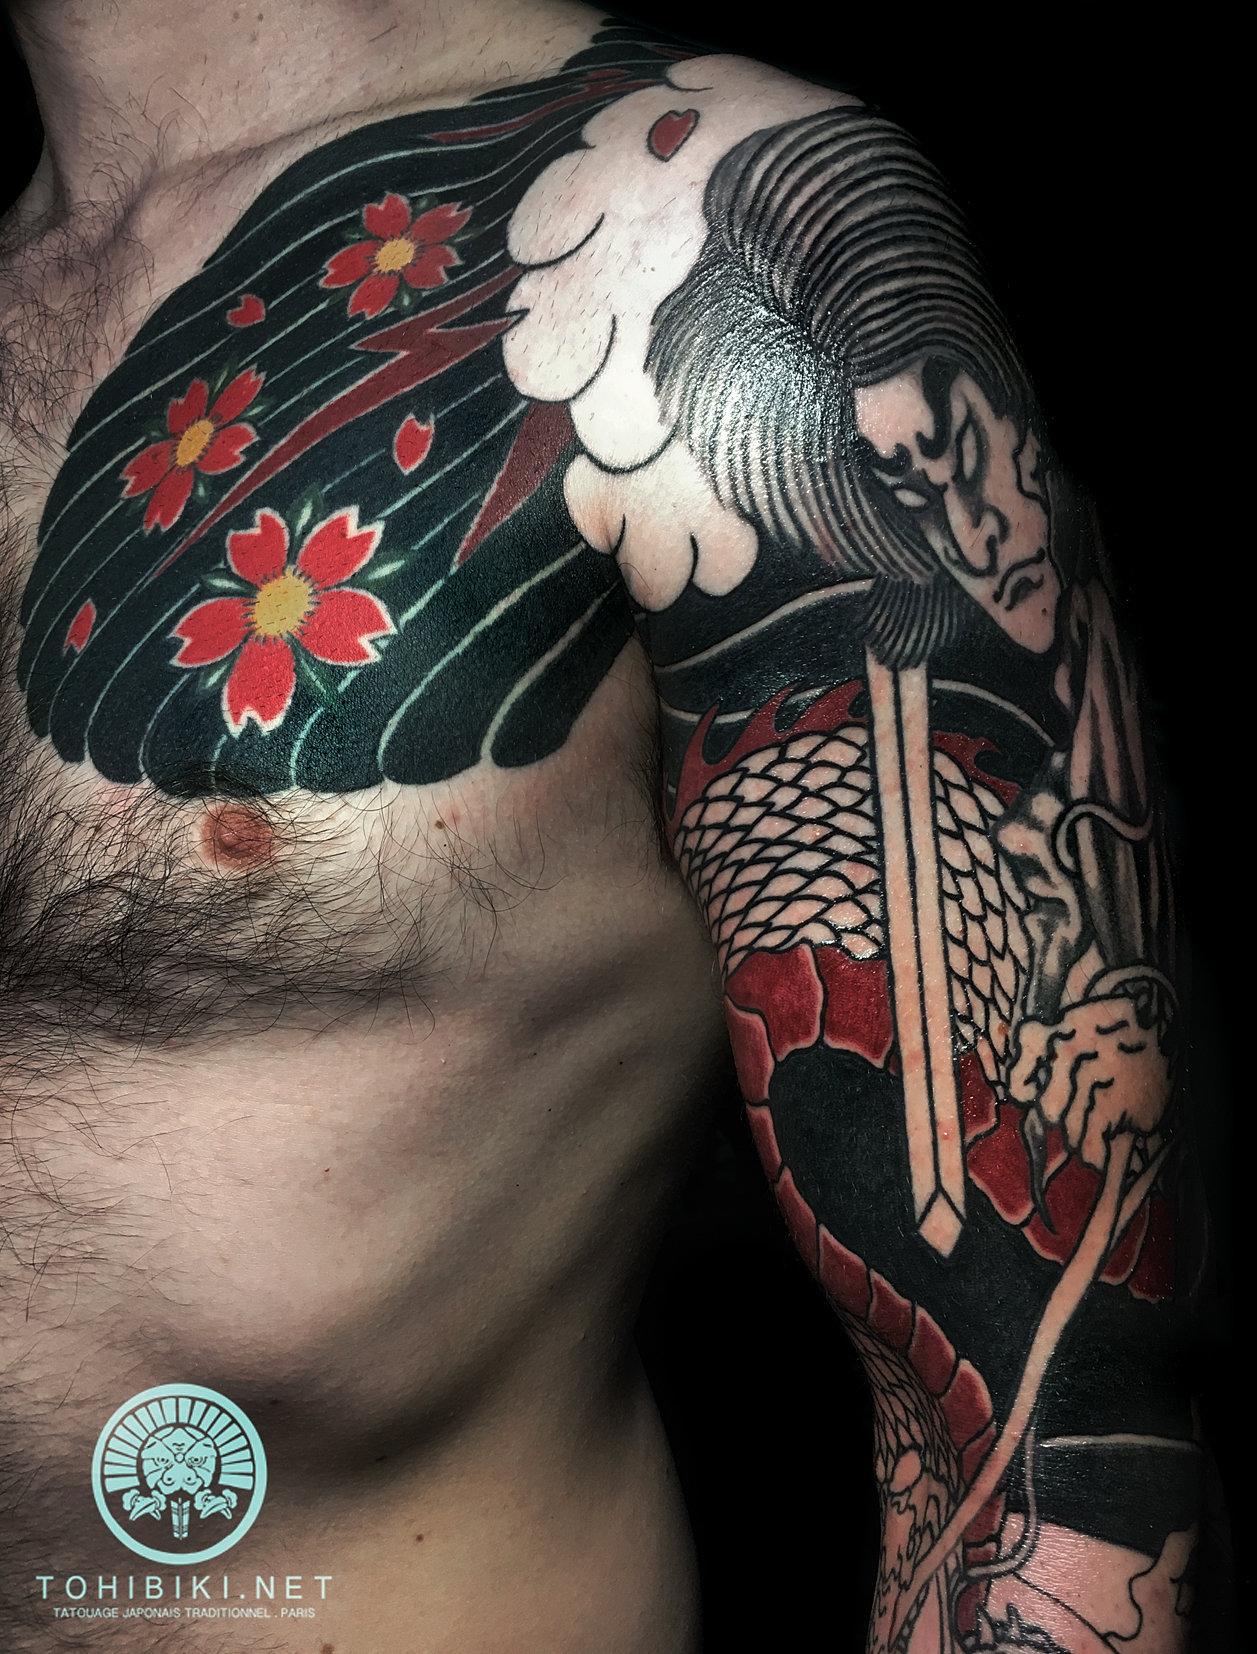 tatouage traditionnel japonais acquigny atelier do no. Black Bedroom Furniture Sets. Home Design Ideas